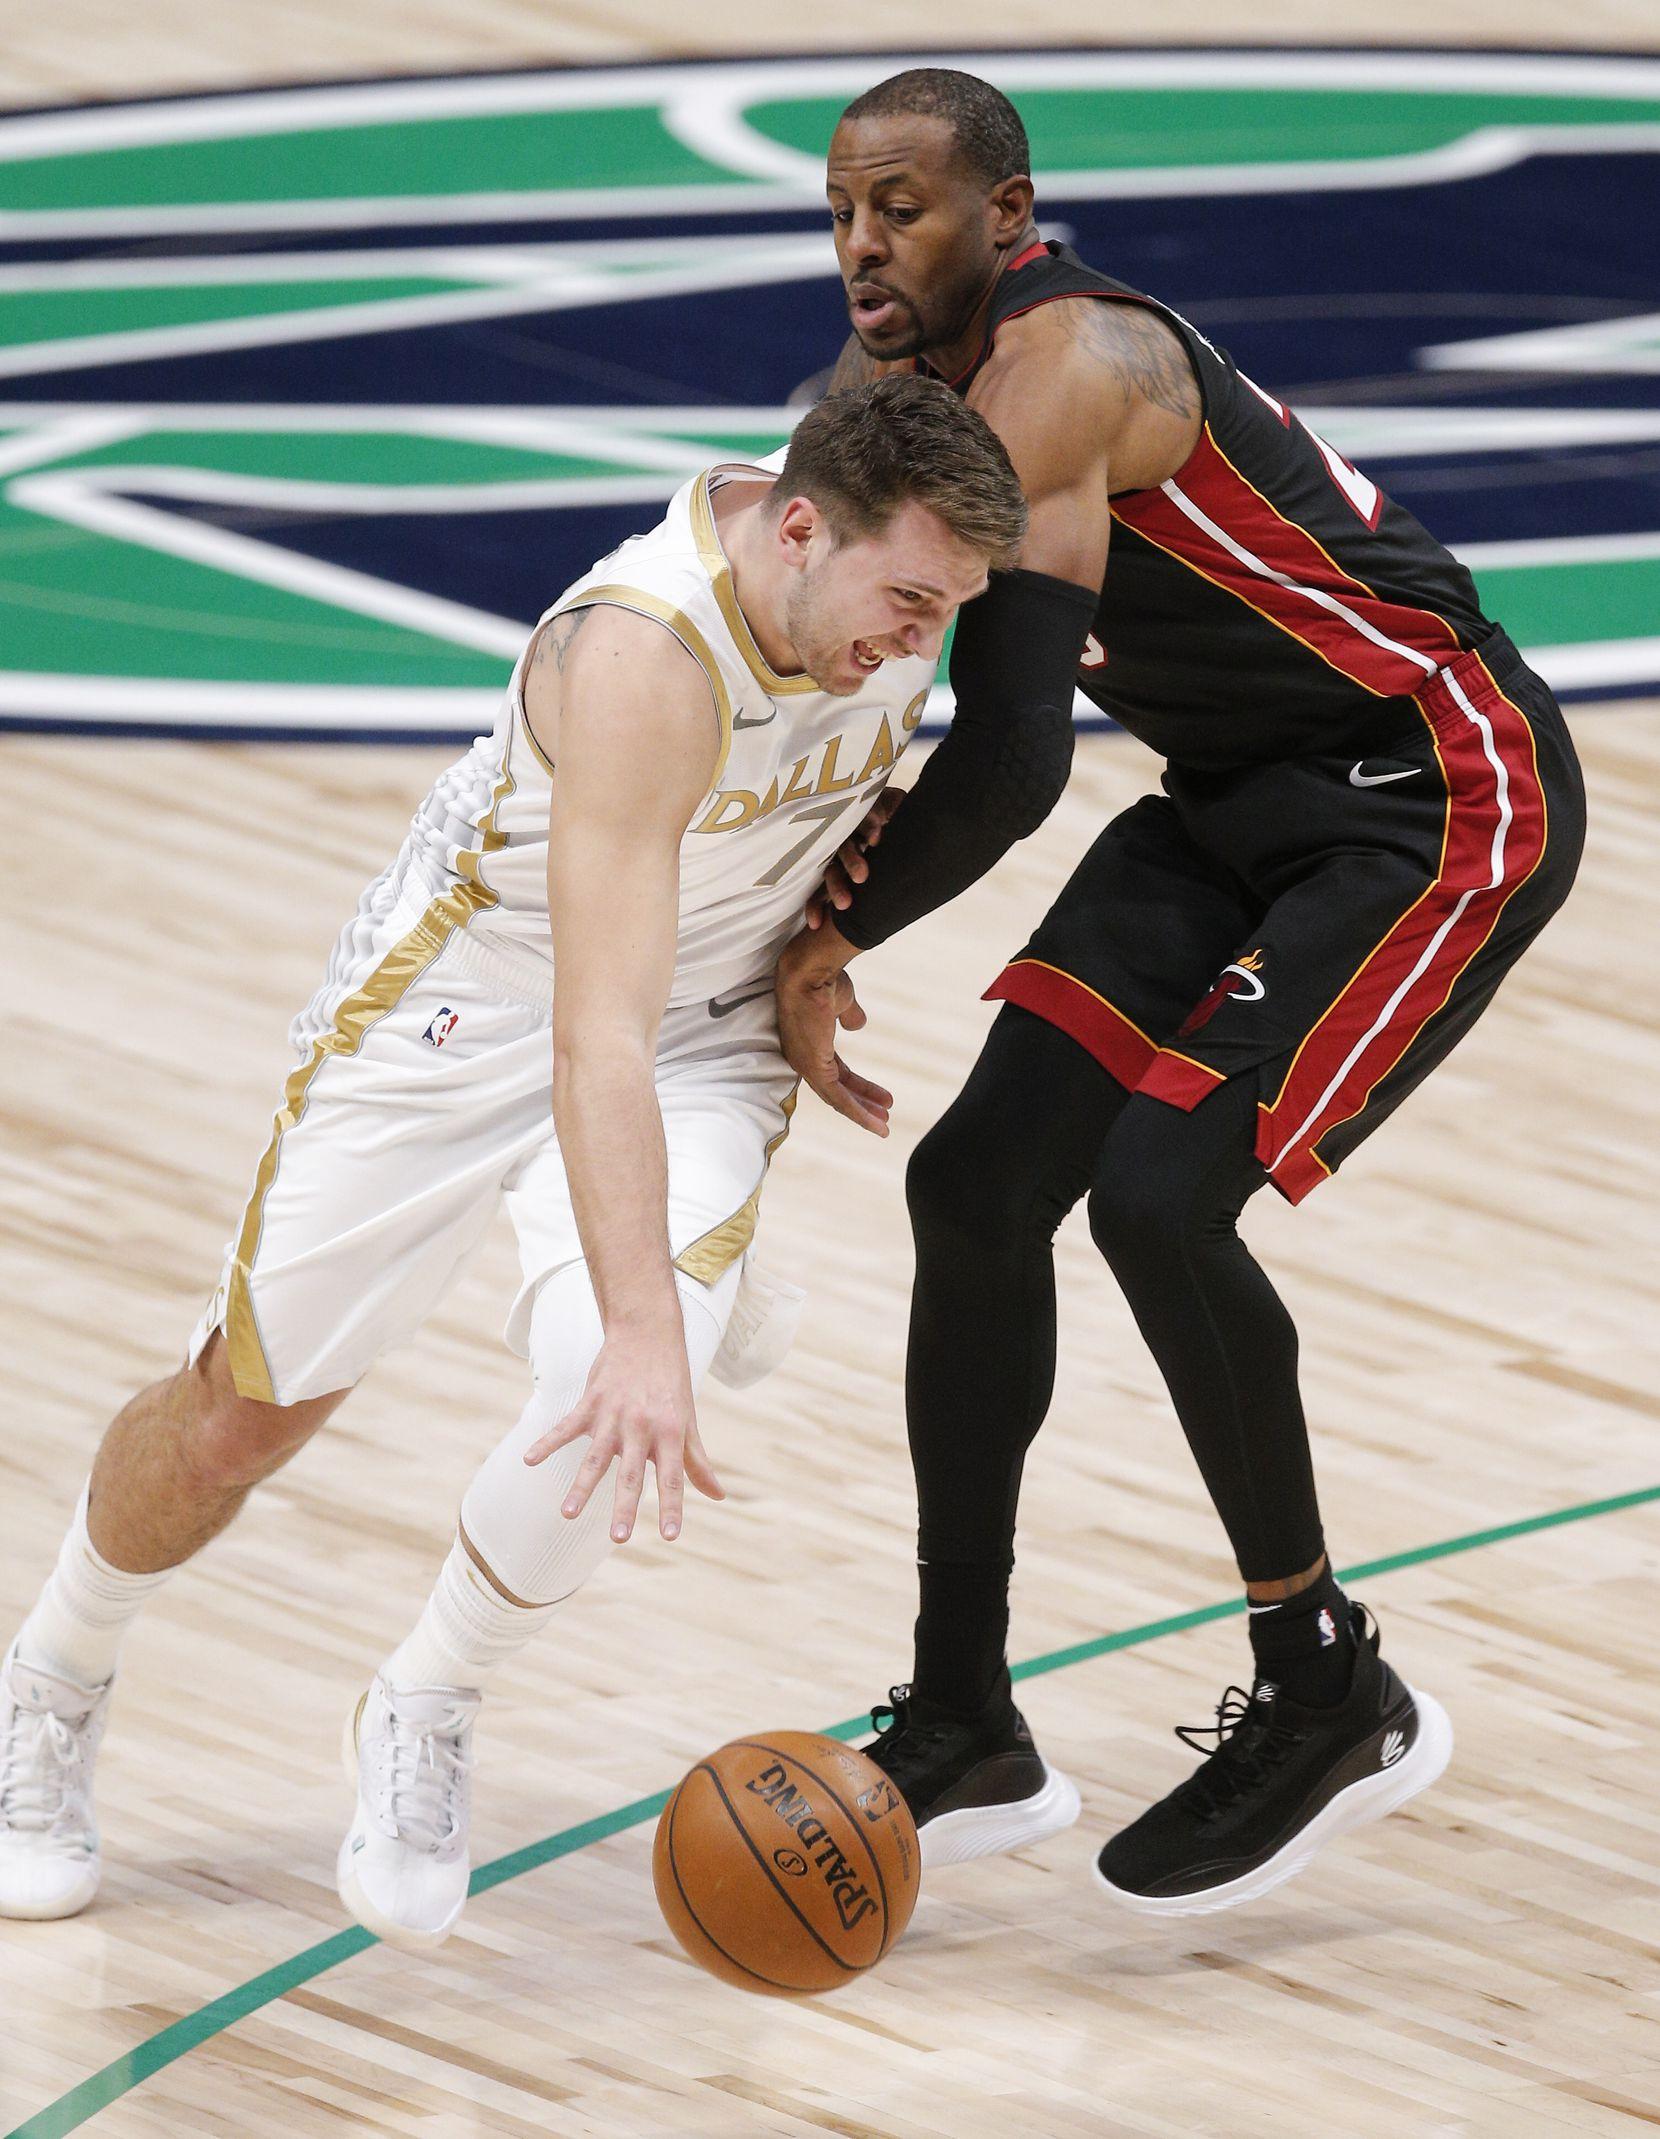 Dallas Mavericks guard Luka Doncic (77) battles Miami Heat guard Andre Iguodala (28) for space during the first half of an NBA basketball game, Friday, January 1, 2021. (Brandon Wade/Special Contributor)